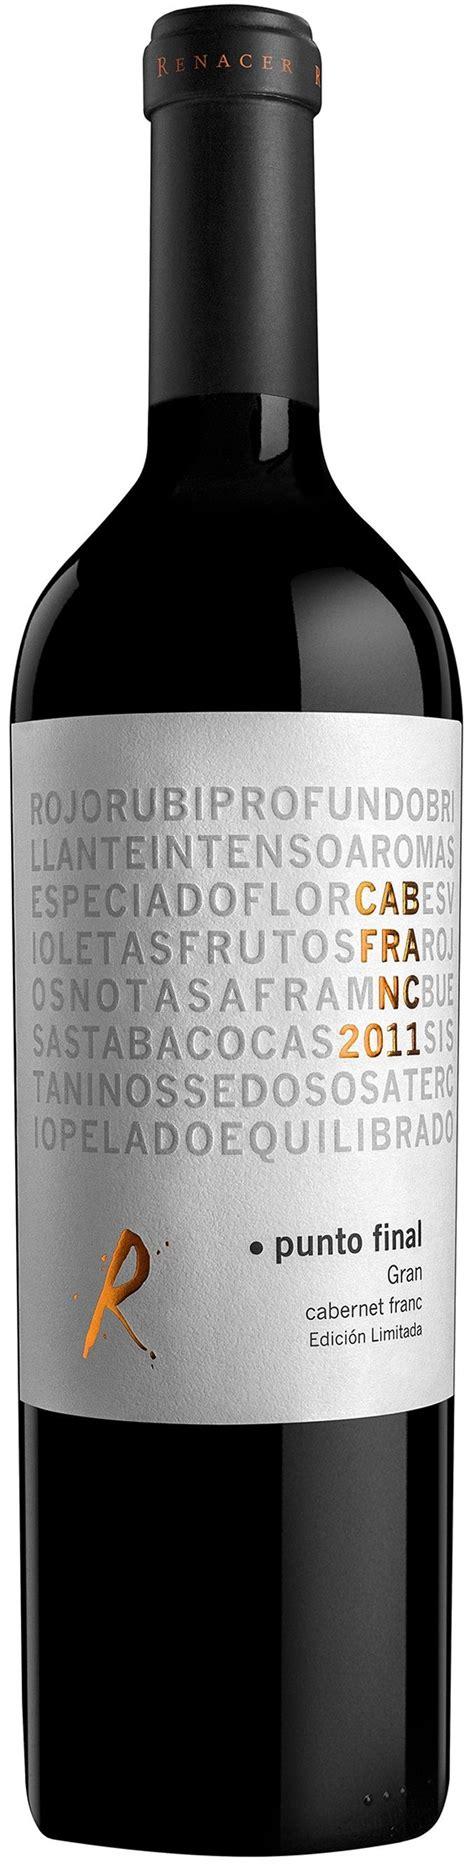 best wine label design 25 best ideas about wine labels on wine label